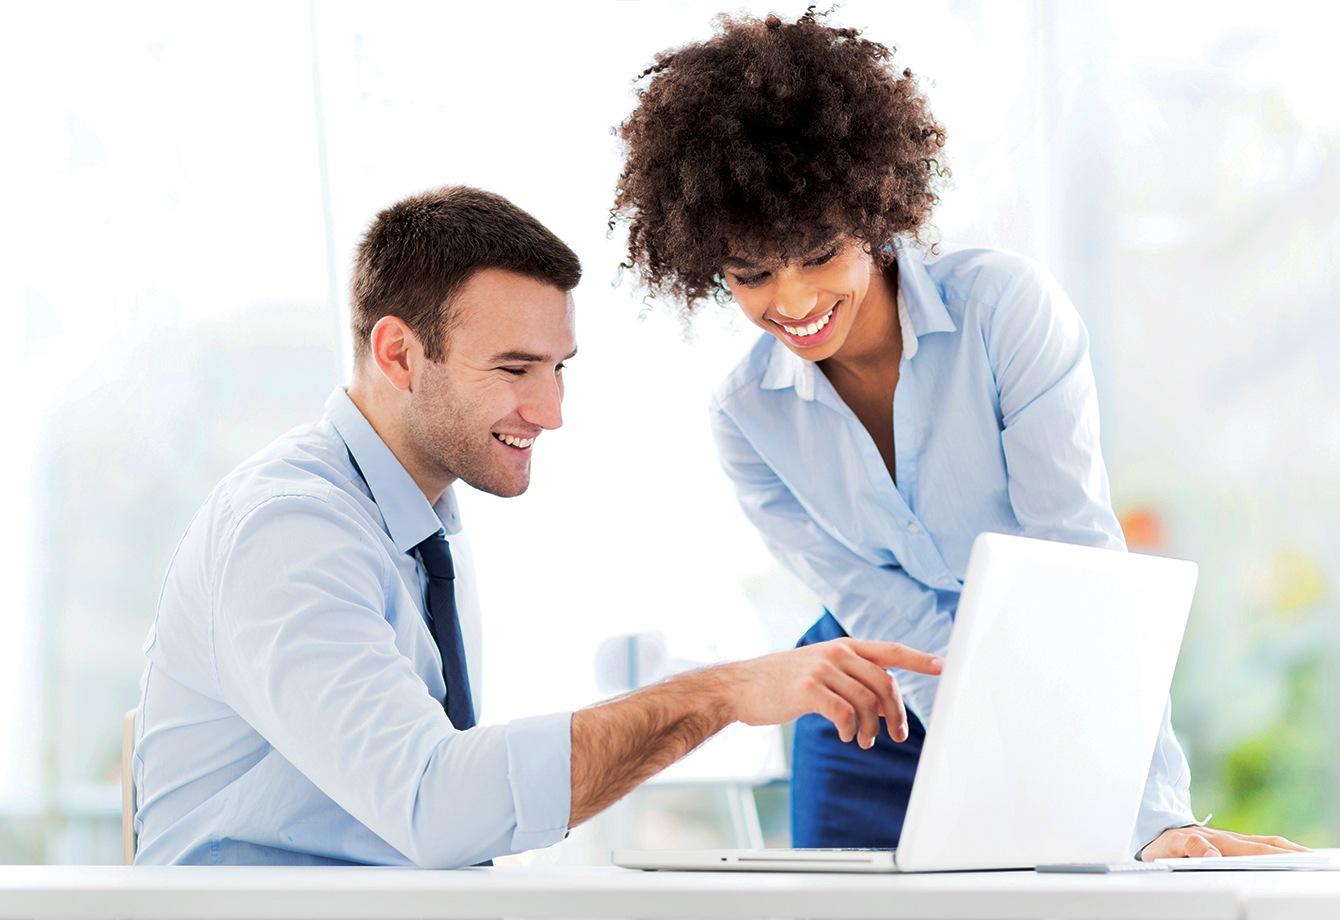 4.5 reasons I (a sales pro) love Autograph e-signature